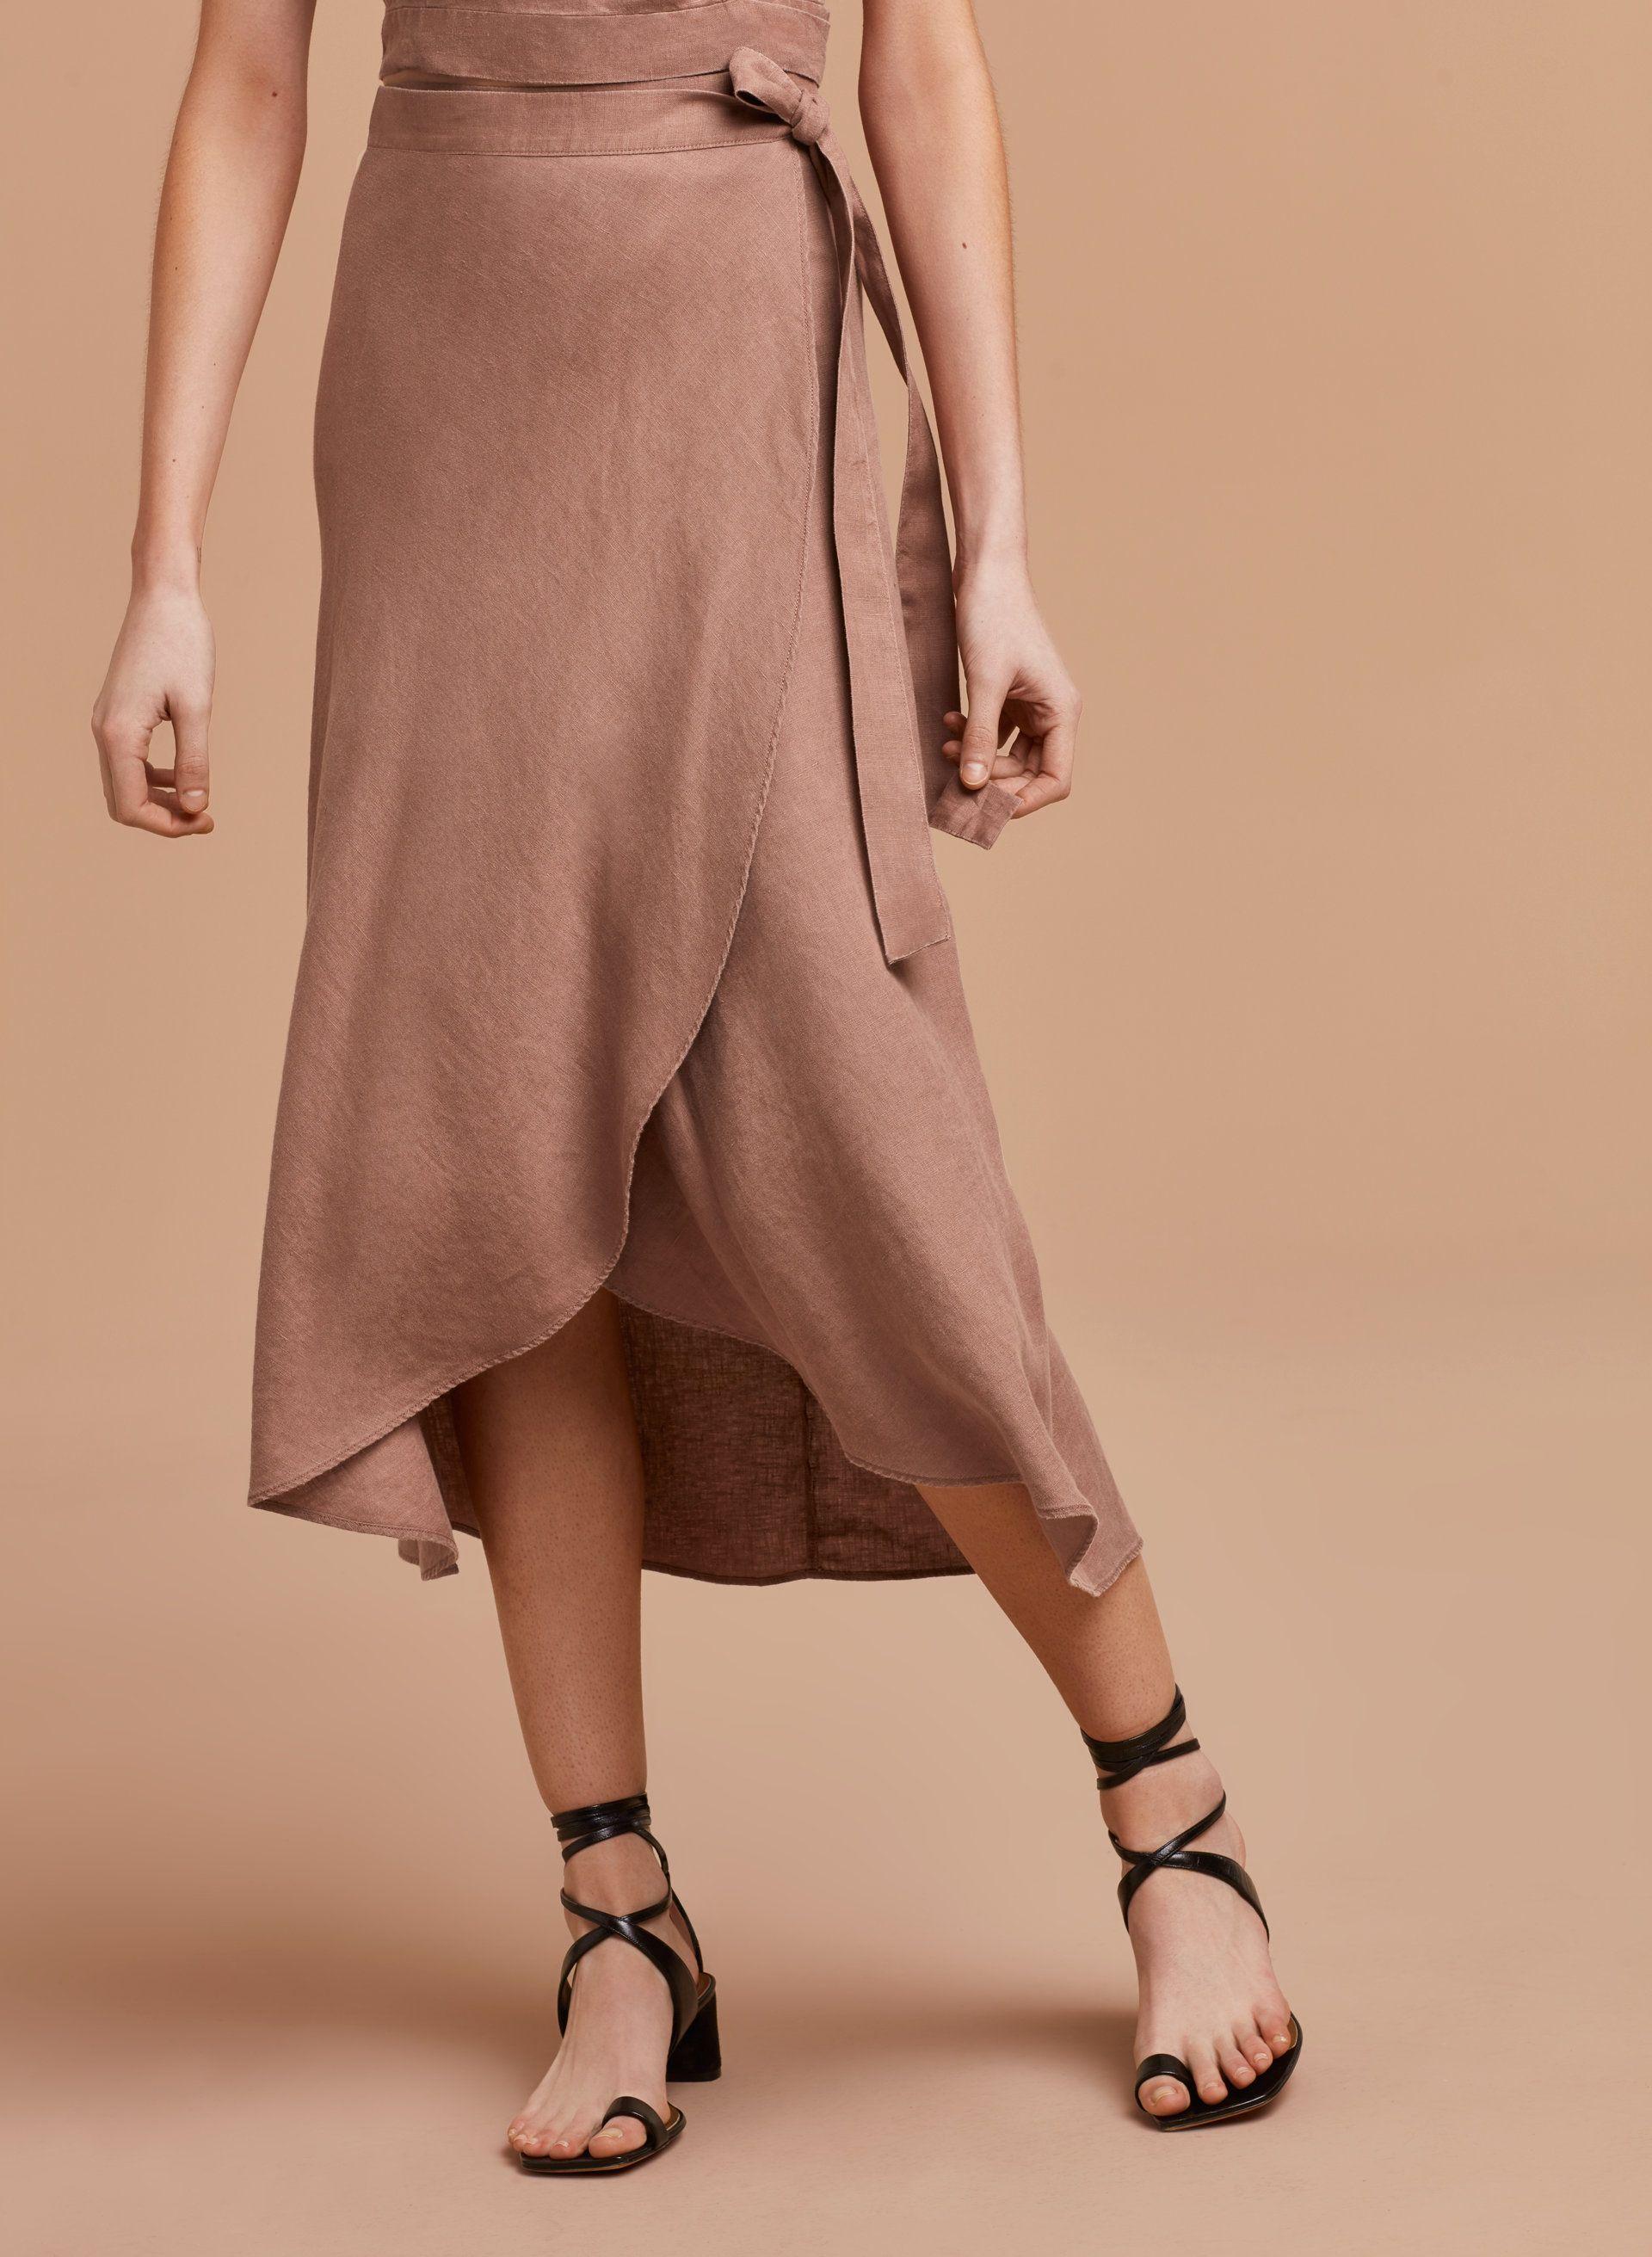 662e0e08b4 Eleta skirt | W A N T: | Skirts, Fashion, Dress up